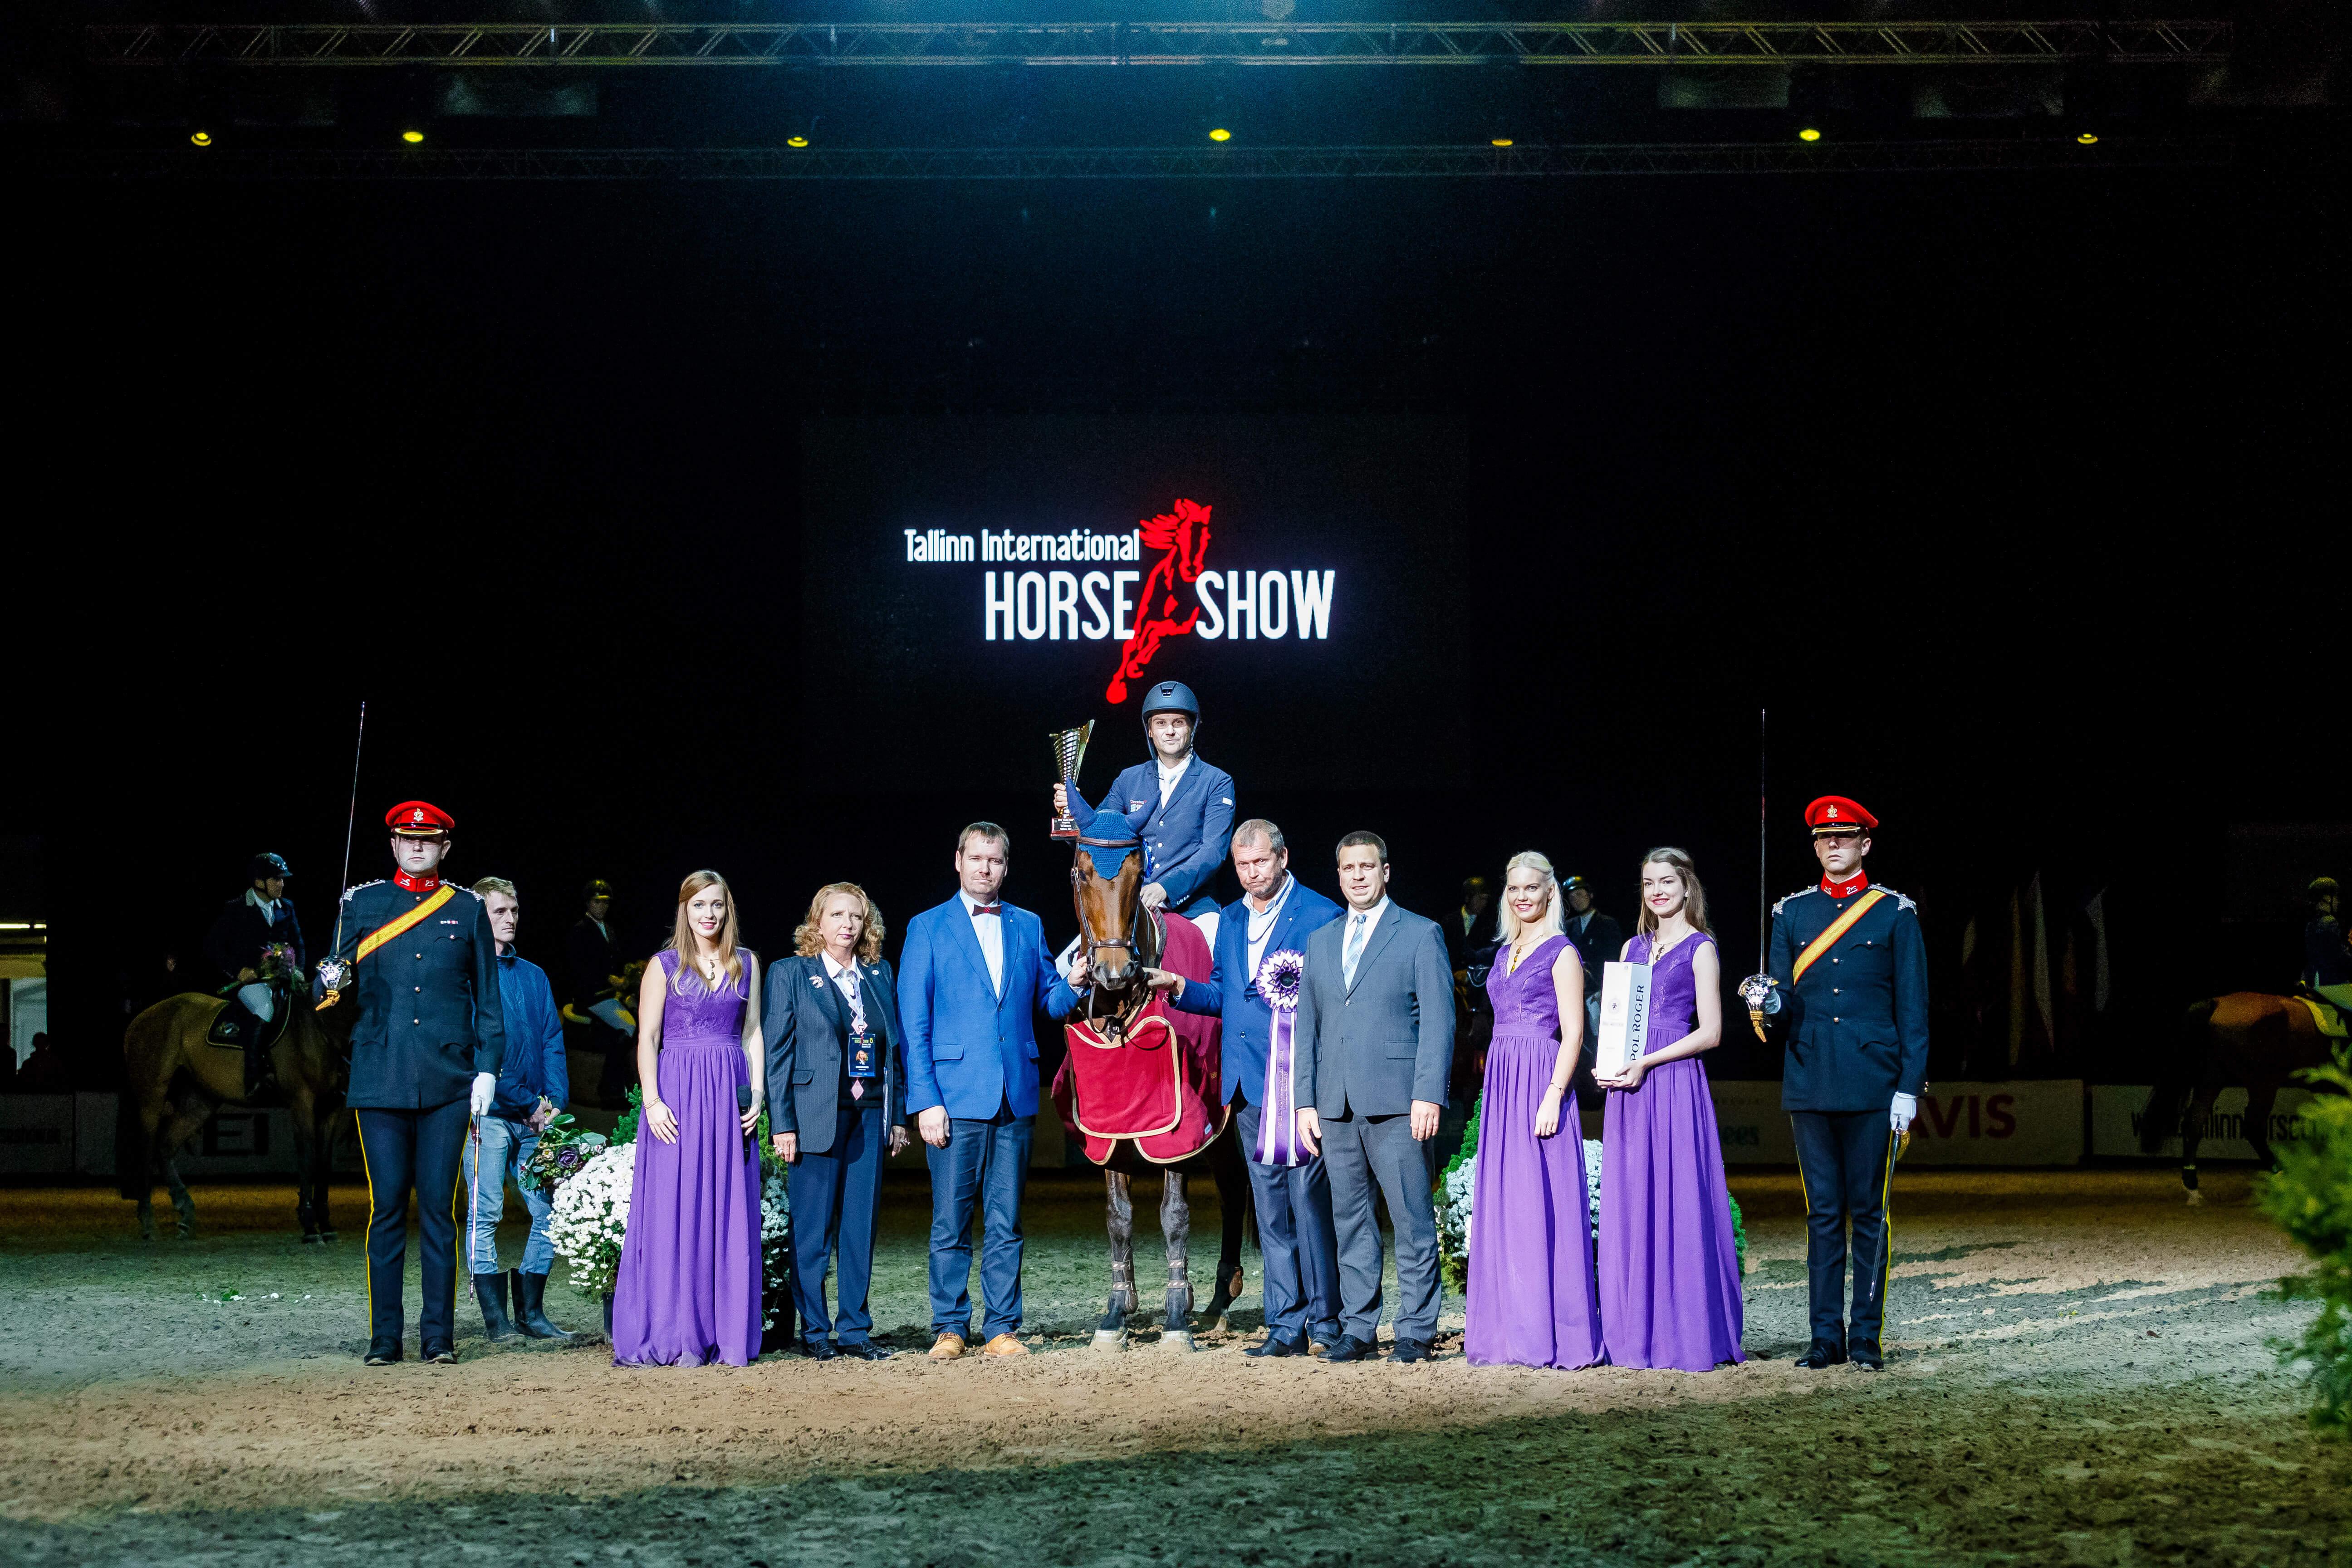 Michal Kazmierczak (POL) - STAKORADO, Hannelore Mariette Ojamae, Karmen Armus, Heiti Haal, Juri Ratas, Marti Haal, Ganna Skabard (UKR), Merilyn Isok. 140-160 cm Alexela Grand Prix, FEI World Cup (CSI2*-W), 8.10.2017 @ Tallinn International Horse Show 2017 Foto: Kylli Tedre-Gavrilov / www.kyllitedre.com